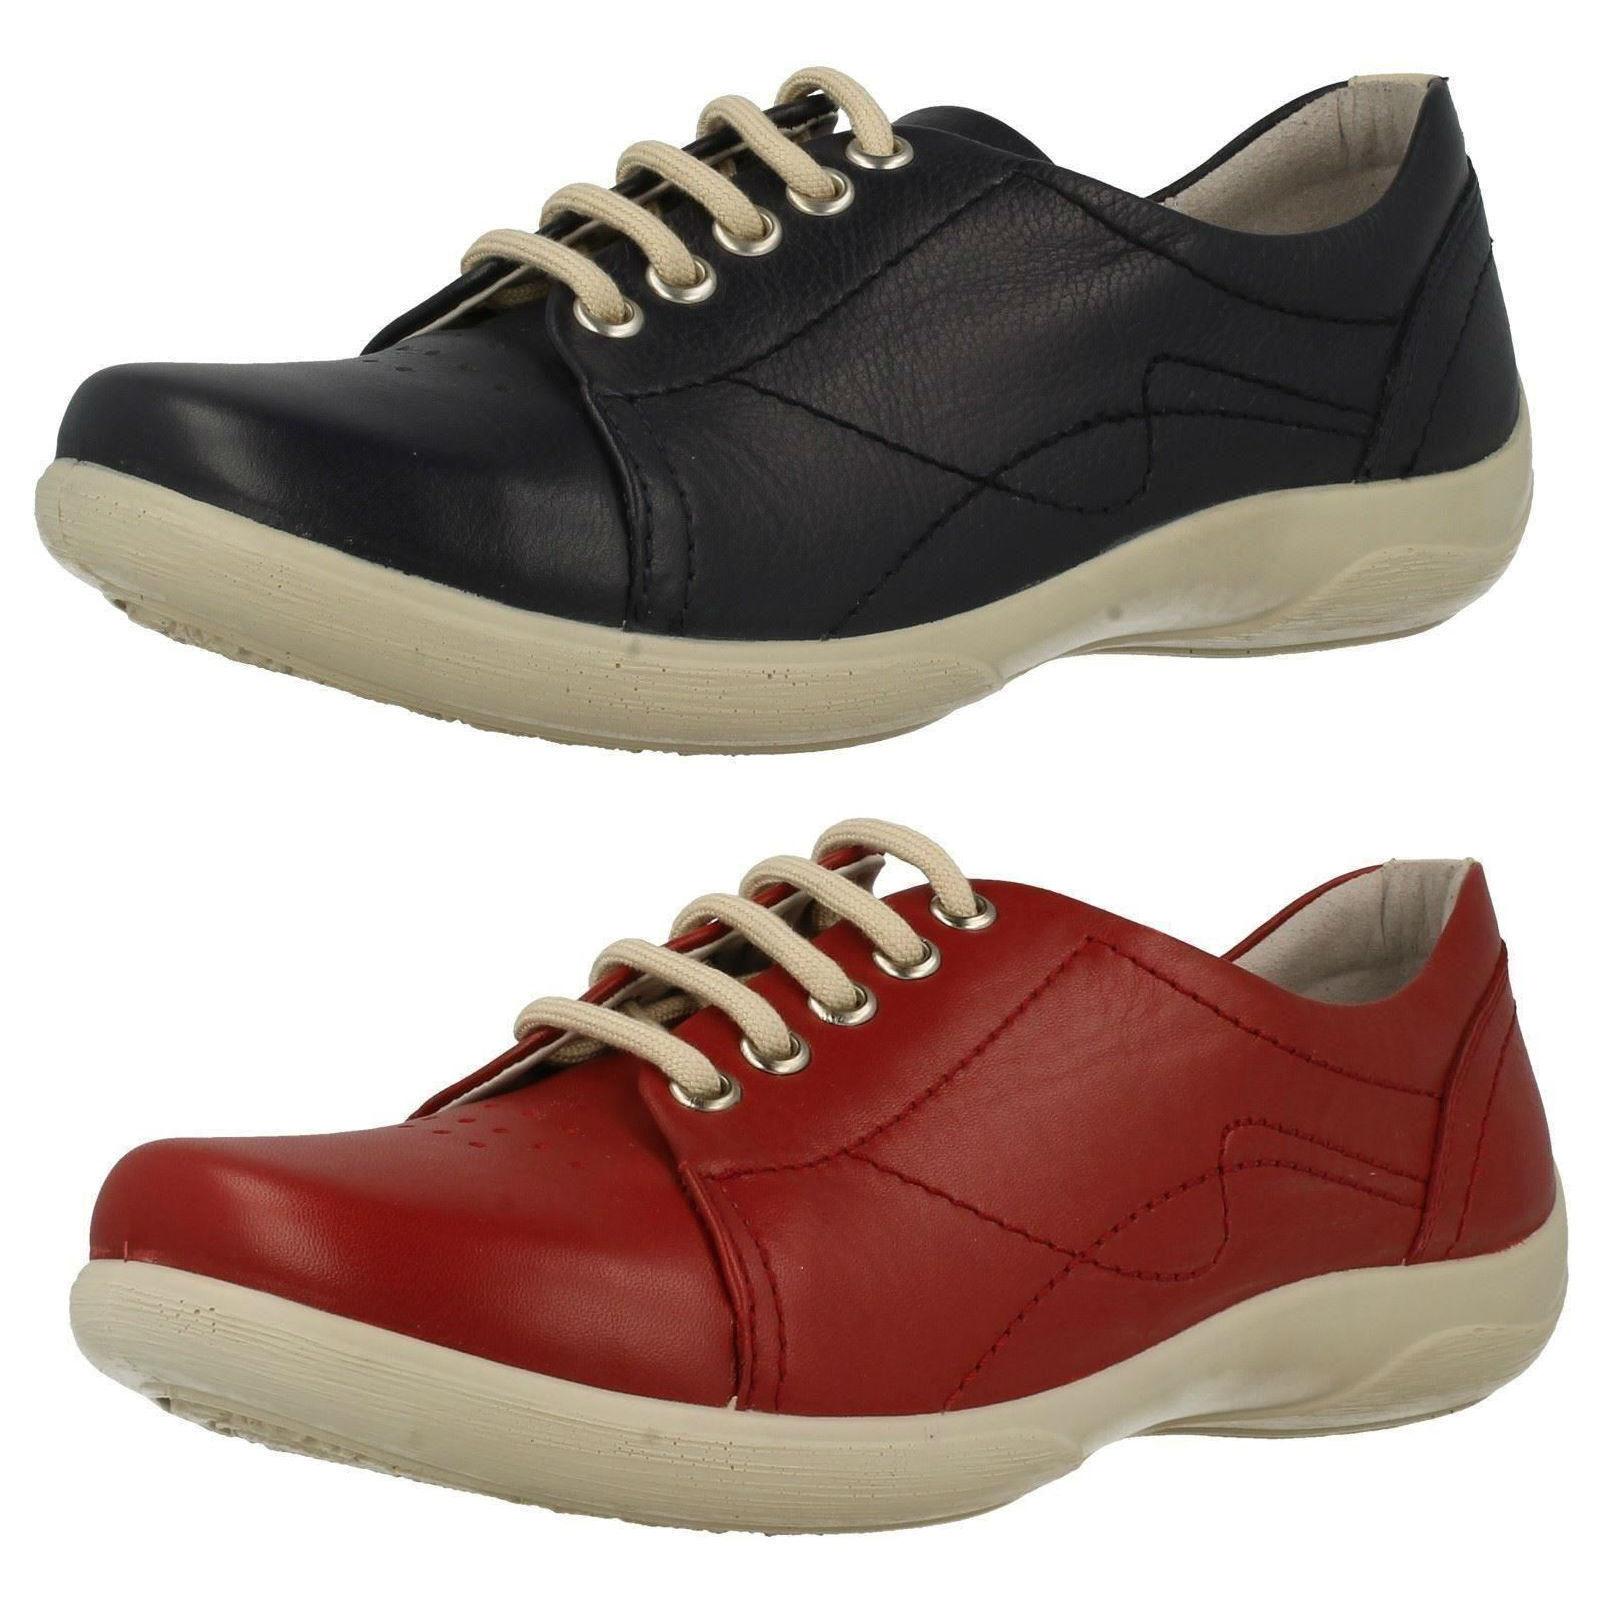 Casual salvaje Padders Mujer Cordones Cuero Rojo Corte Ancho Zapato